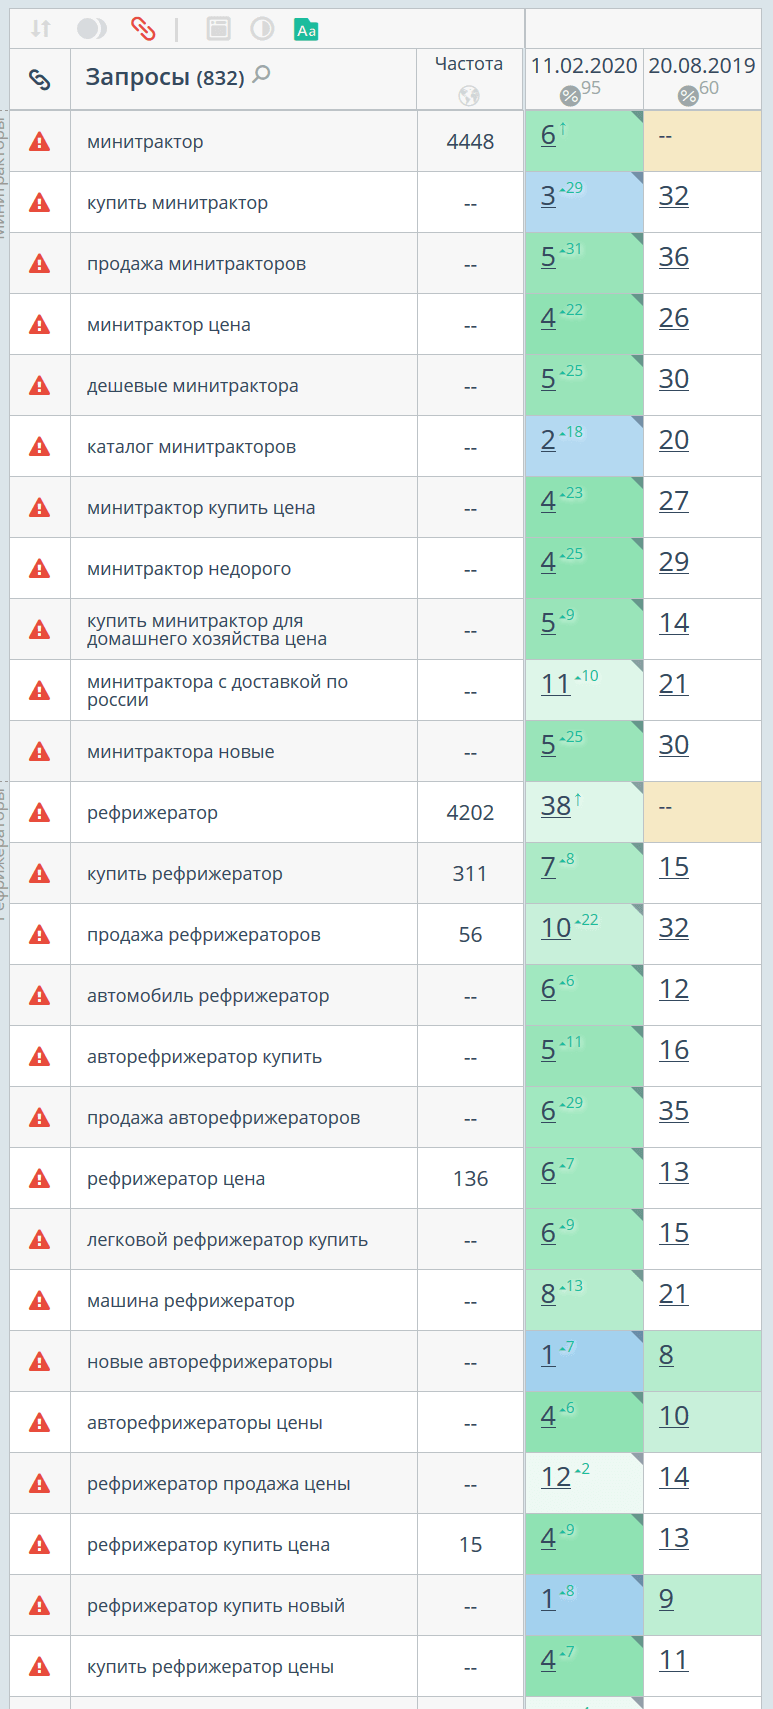 Статистика позиций по Яндексу, регион Екатеринбург